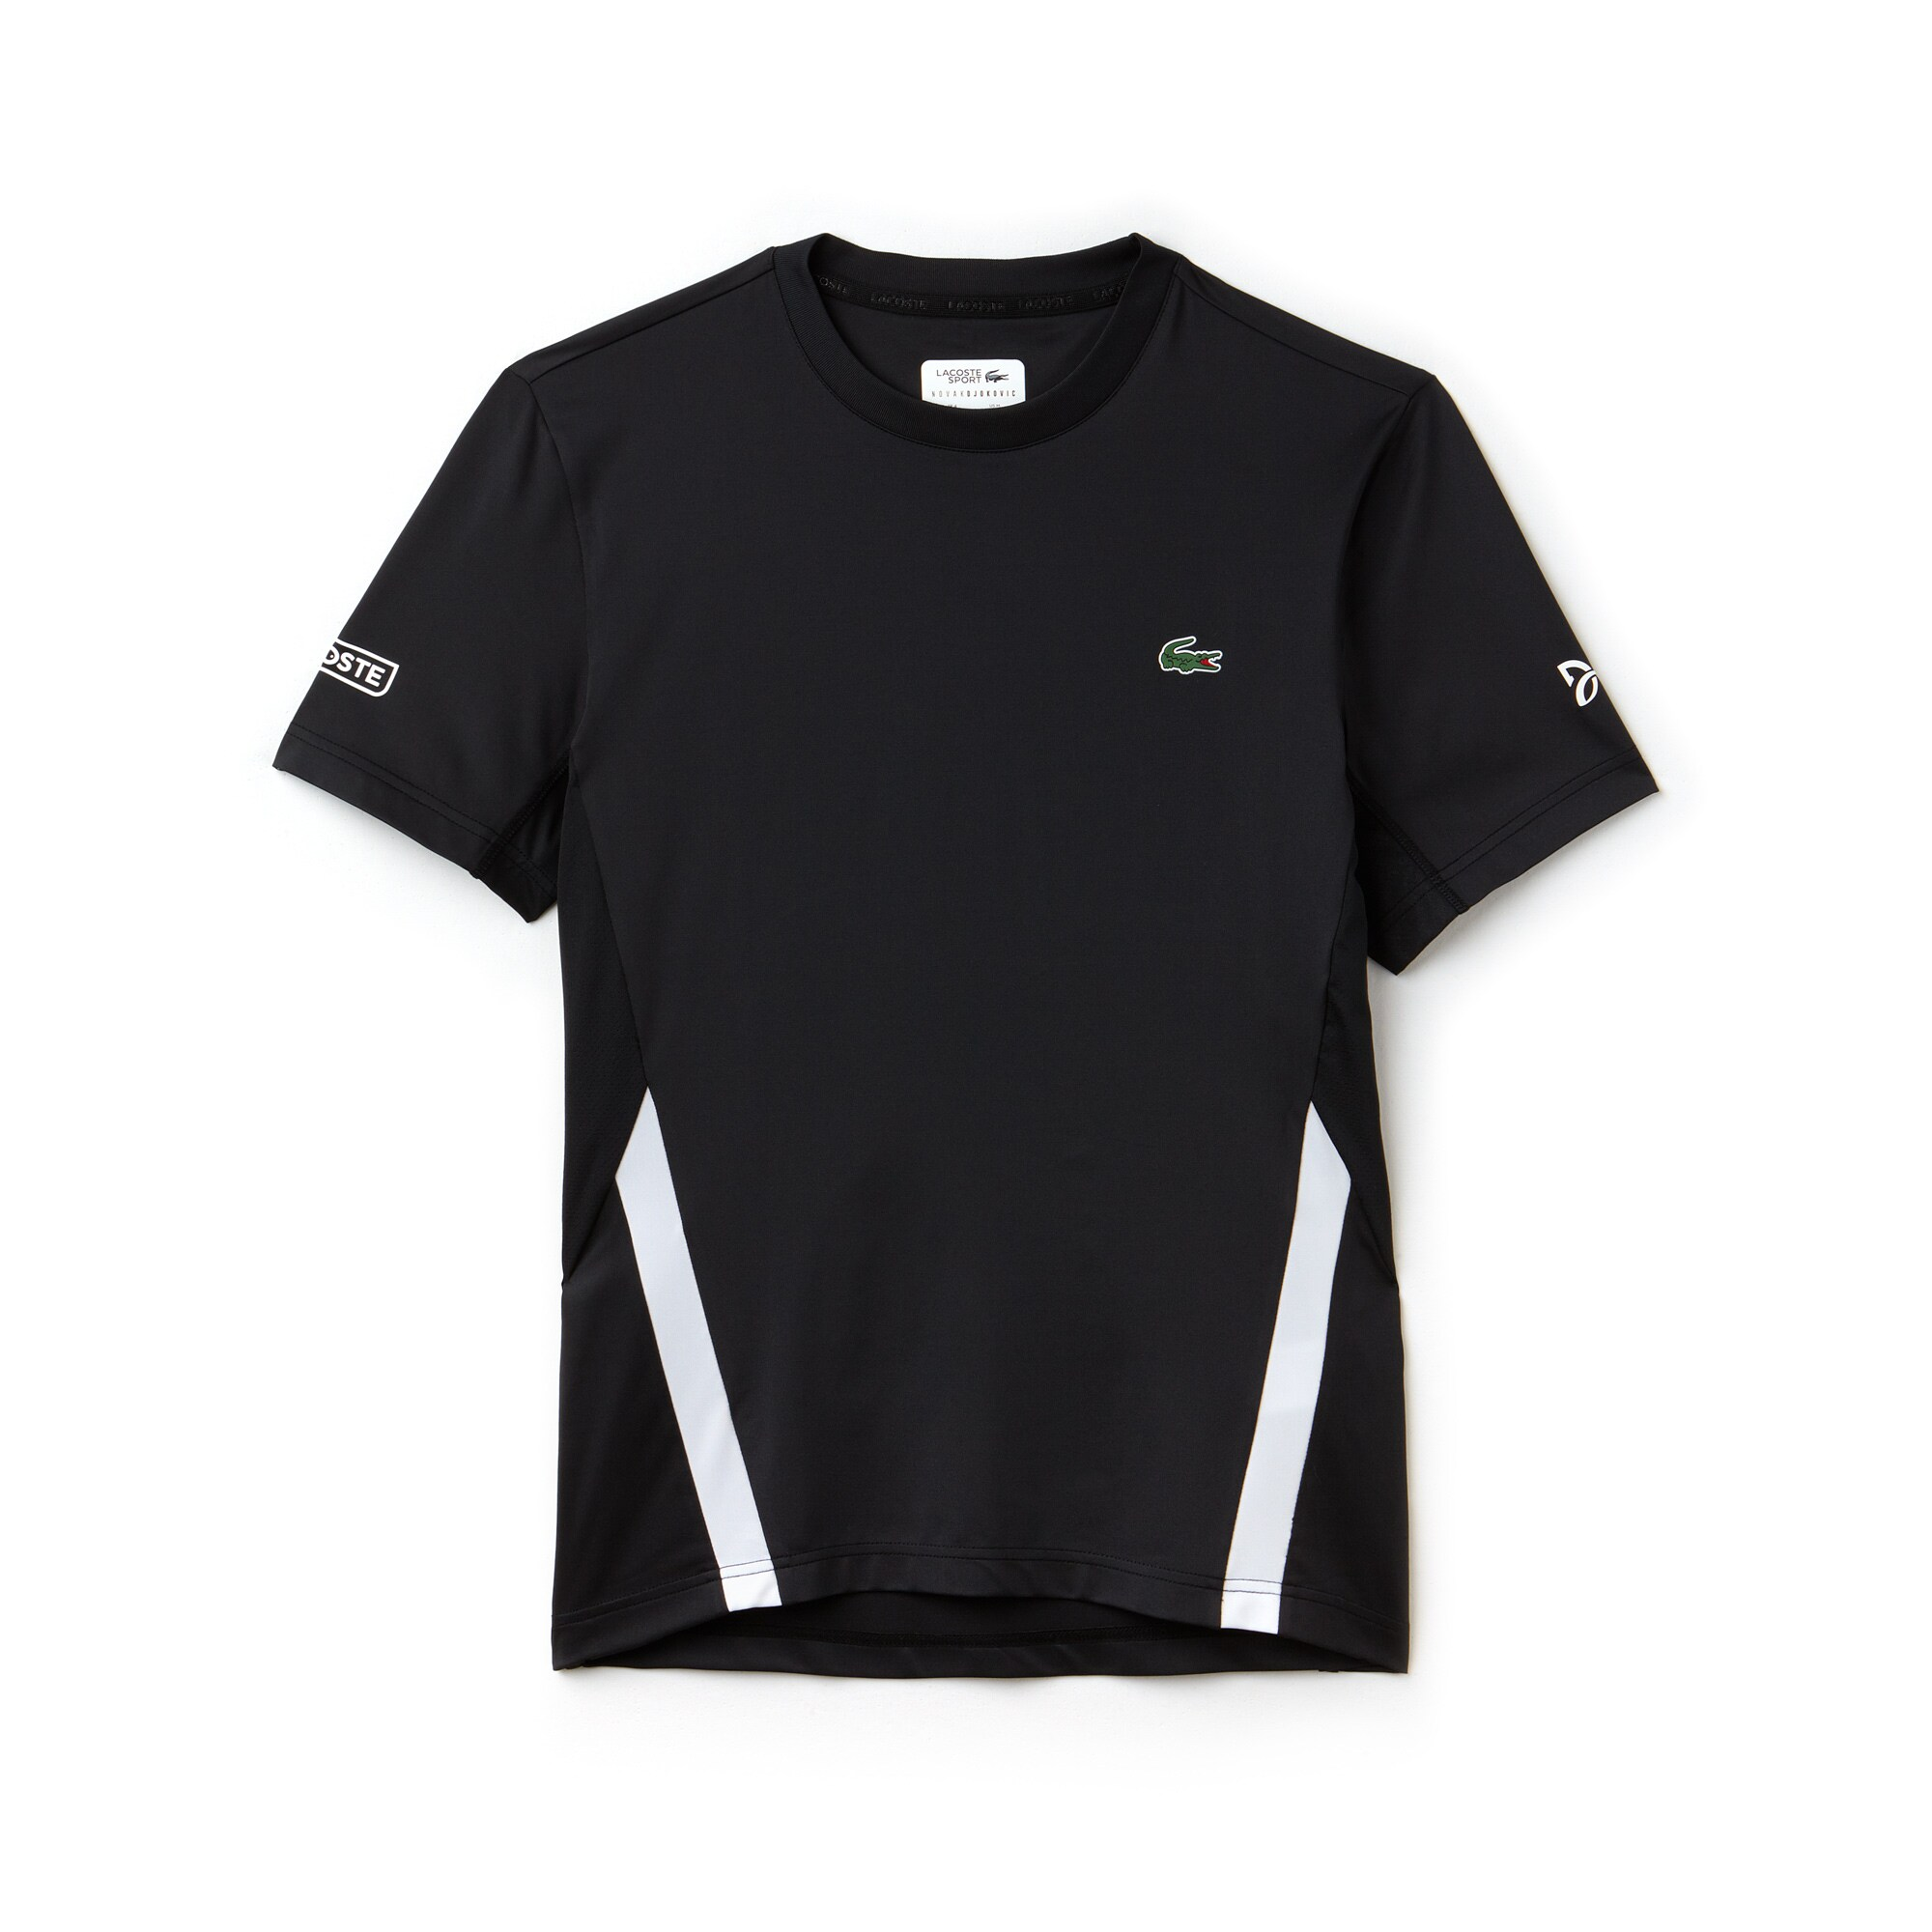 Camiseta De Hombre Lacoste SPORT Novak Djokovic -Off Court Collection En Tejido De Punto Técnico Elástico Con Cuello Redondo